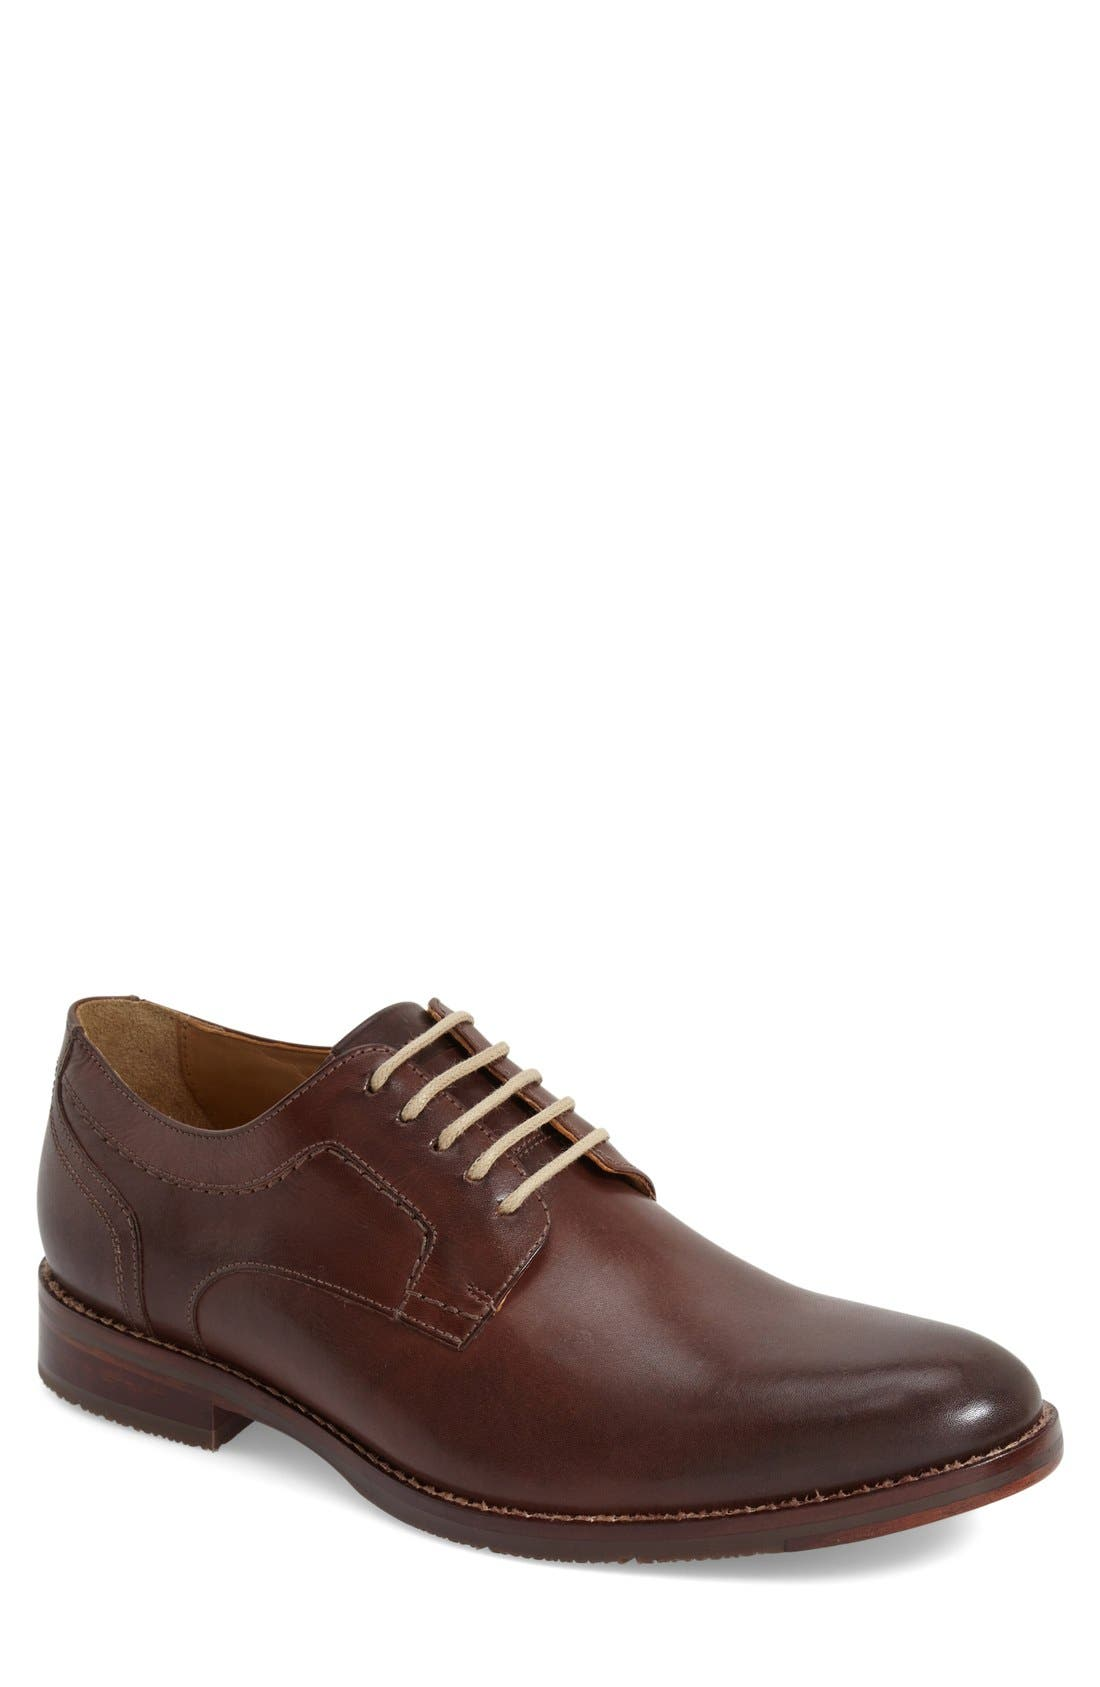 'Garner' Plain Toe Derby,                         Main,                         color, Mahogany Calfskin